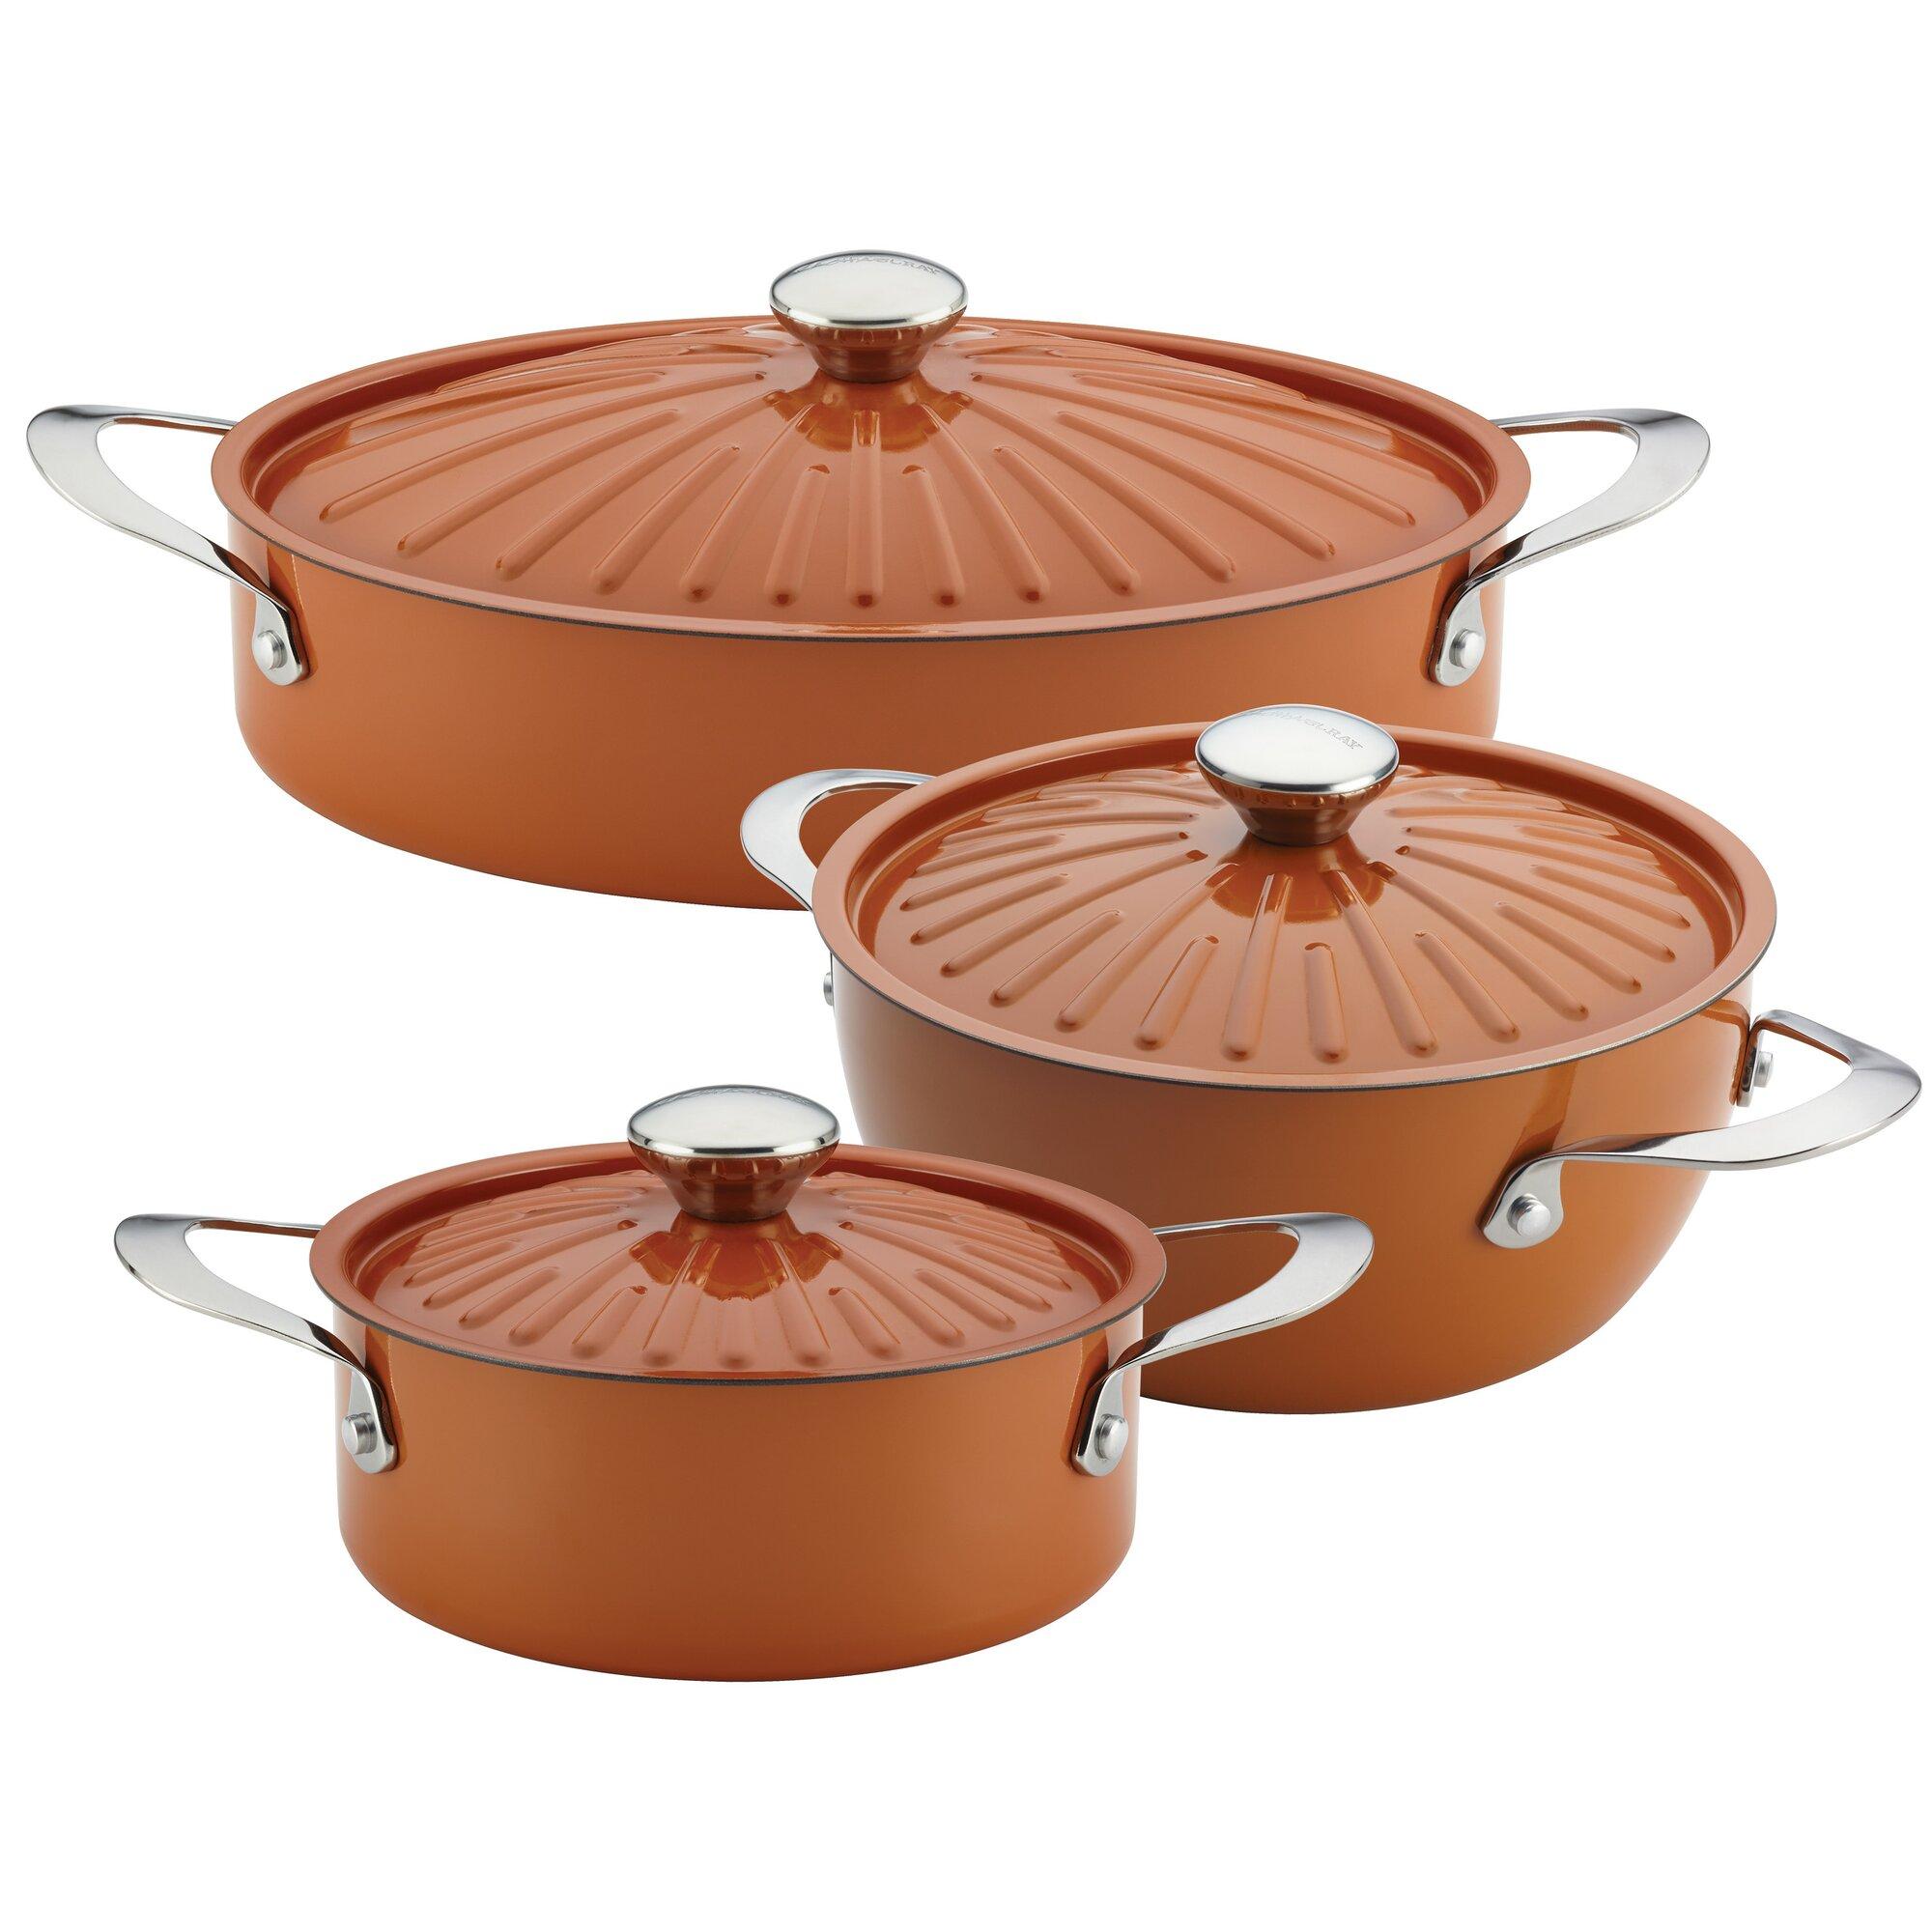 Rachael Ray Cucina 6 Piece Non-Stick Cookware Set & Reviews | Wayfair